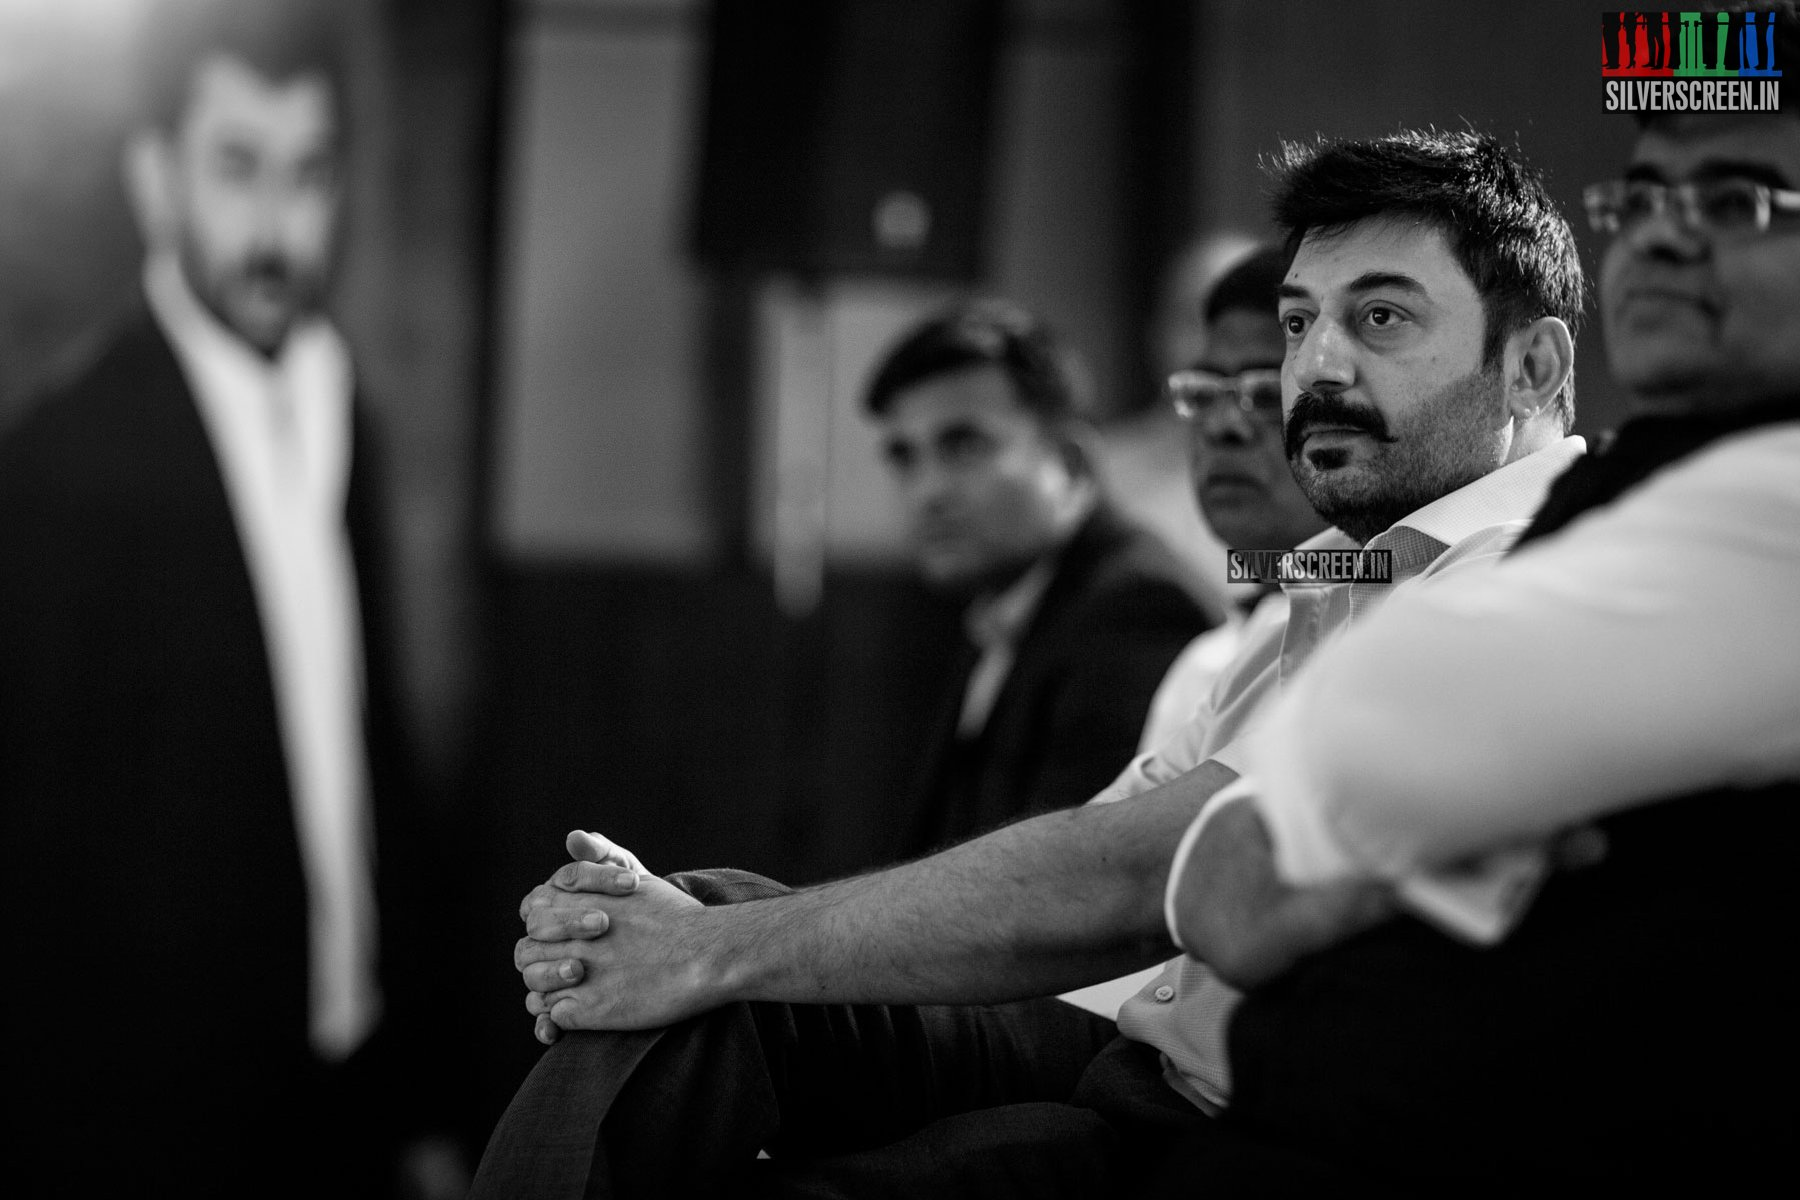 Aravind Swami at 63rd Filmfare Awards 2016 (South) Press Meet